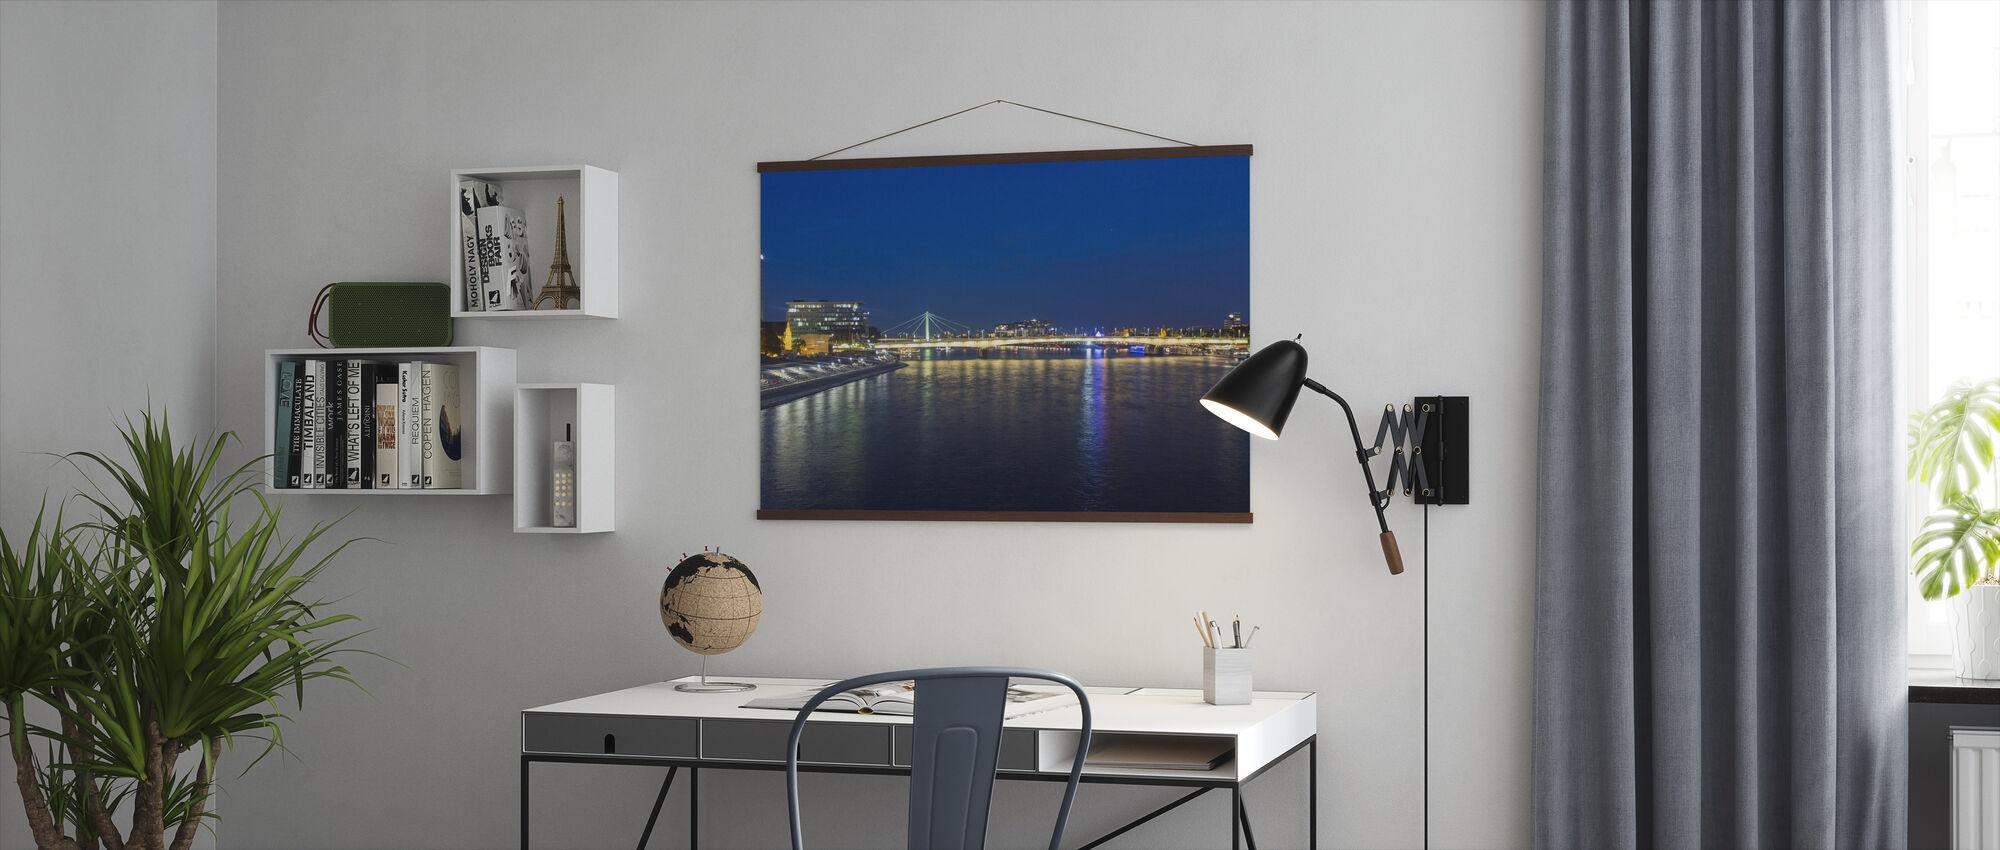 Kaupungin valot heijastus - Juliste - Toimisto